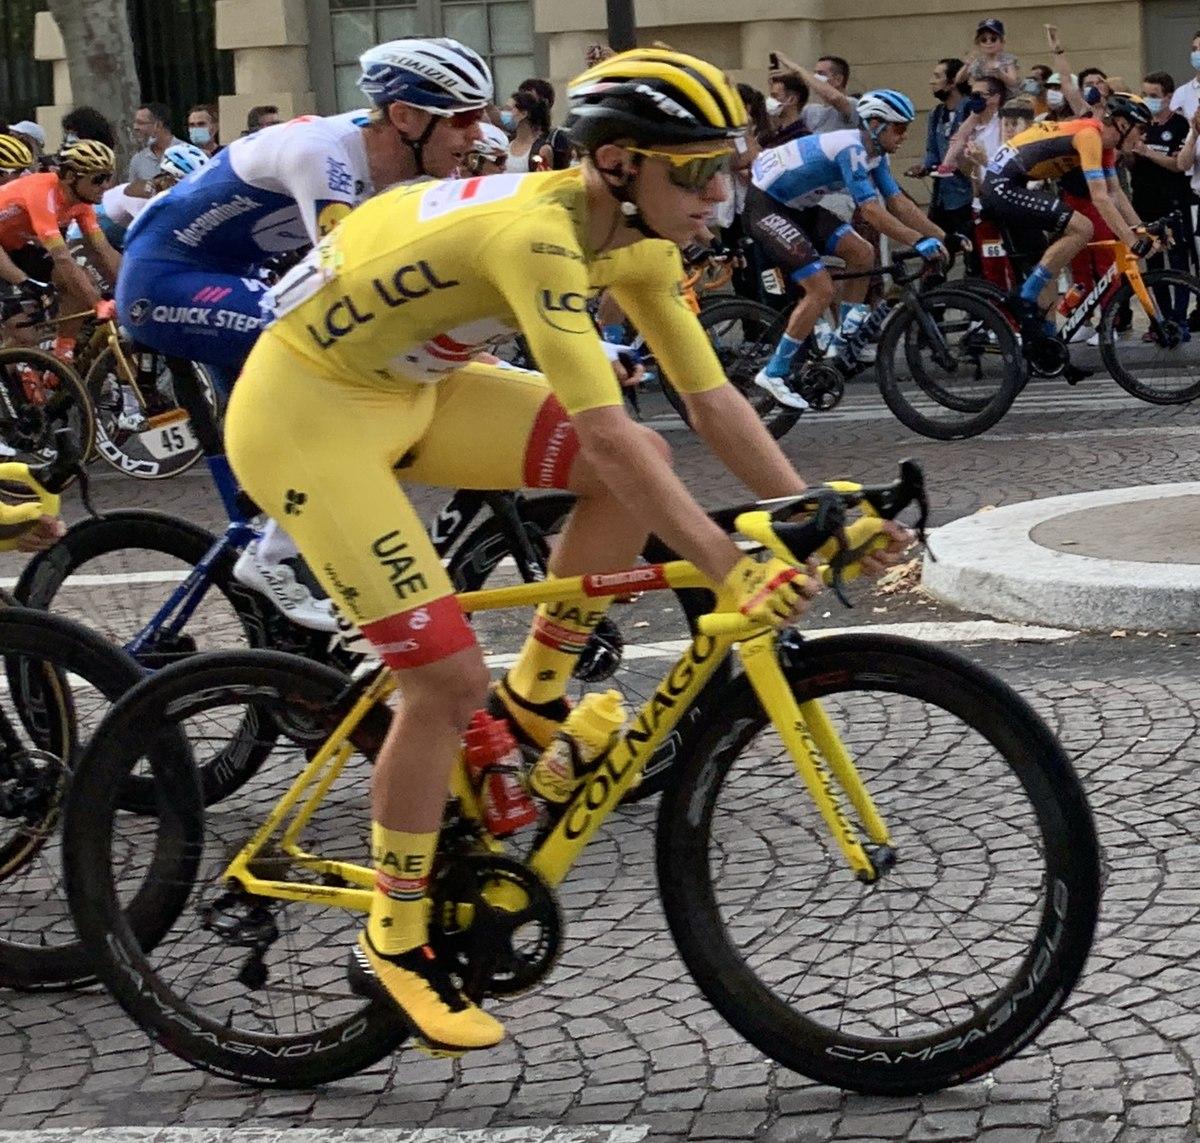 1200px-Tadej_Pogacar_2020-09-20_-_Yellow_jersey_-_Tour_de_France_2020.jpg